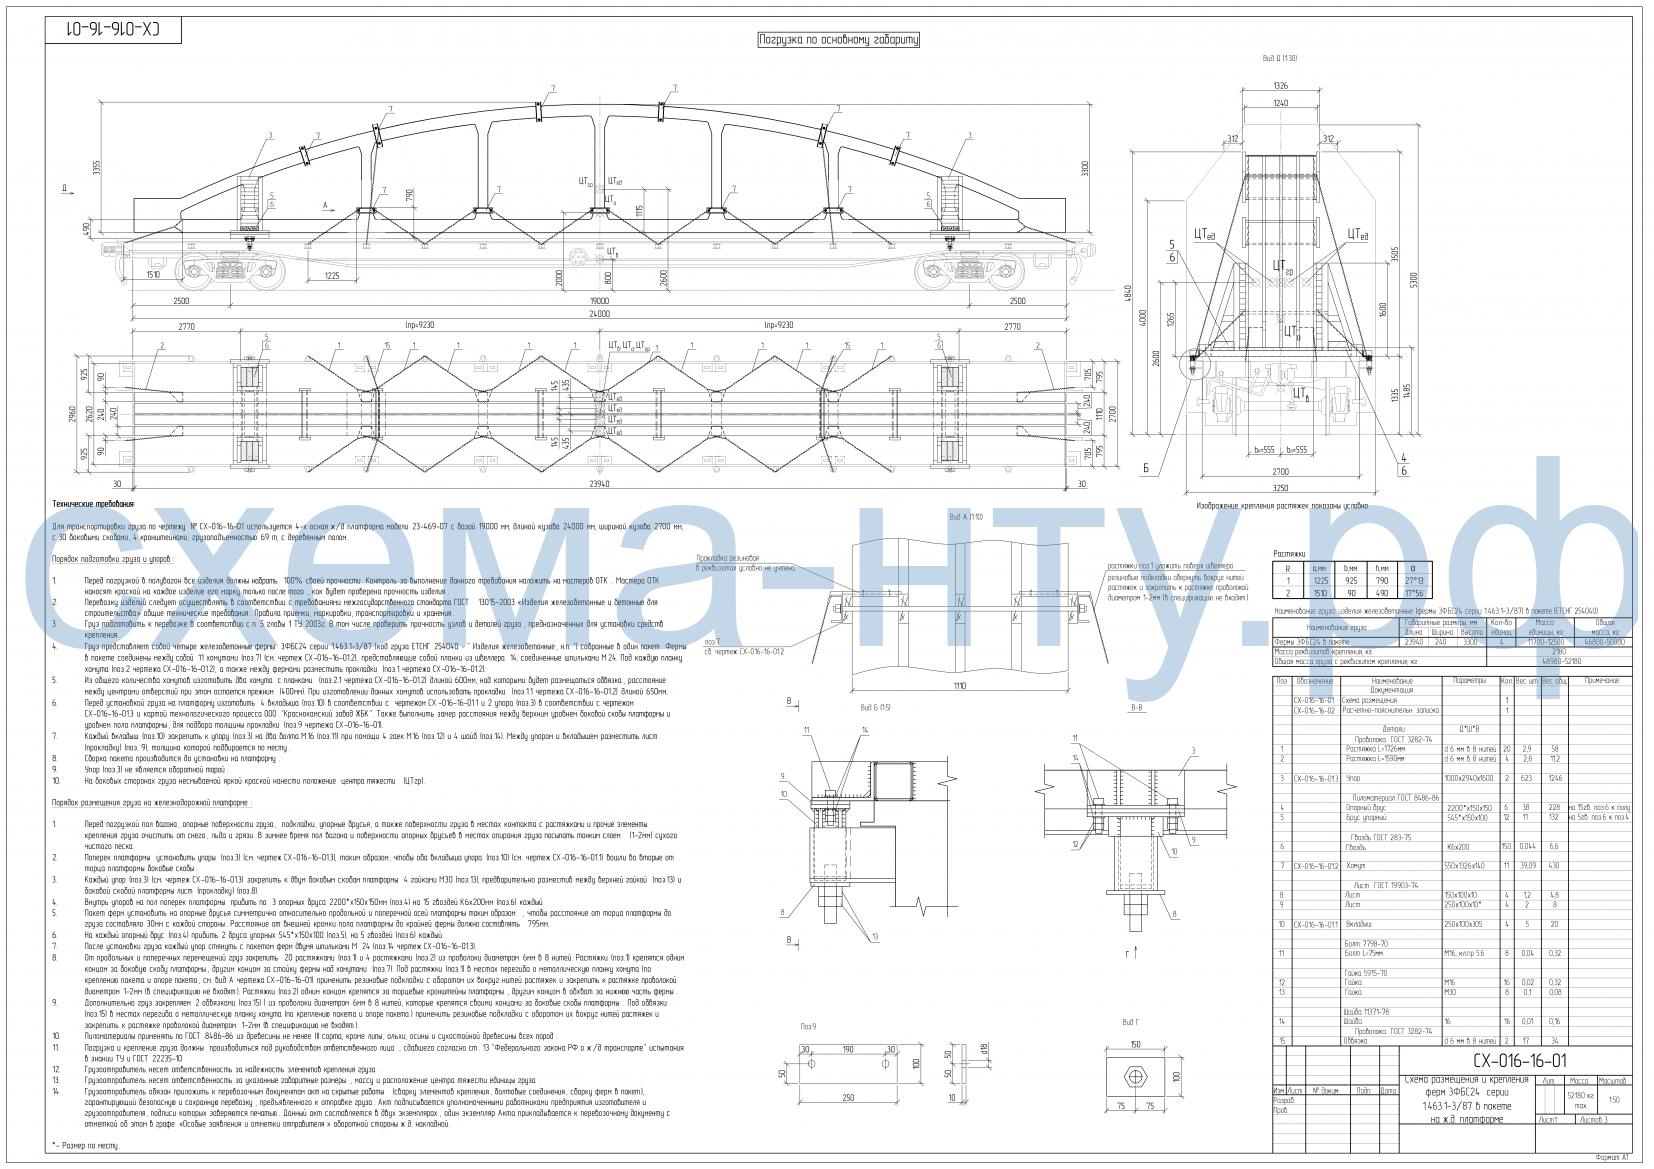 Схема погрузки груза на длиннобазной платформе - чертеж НТУ